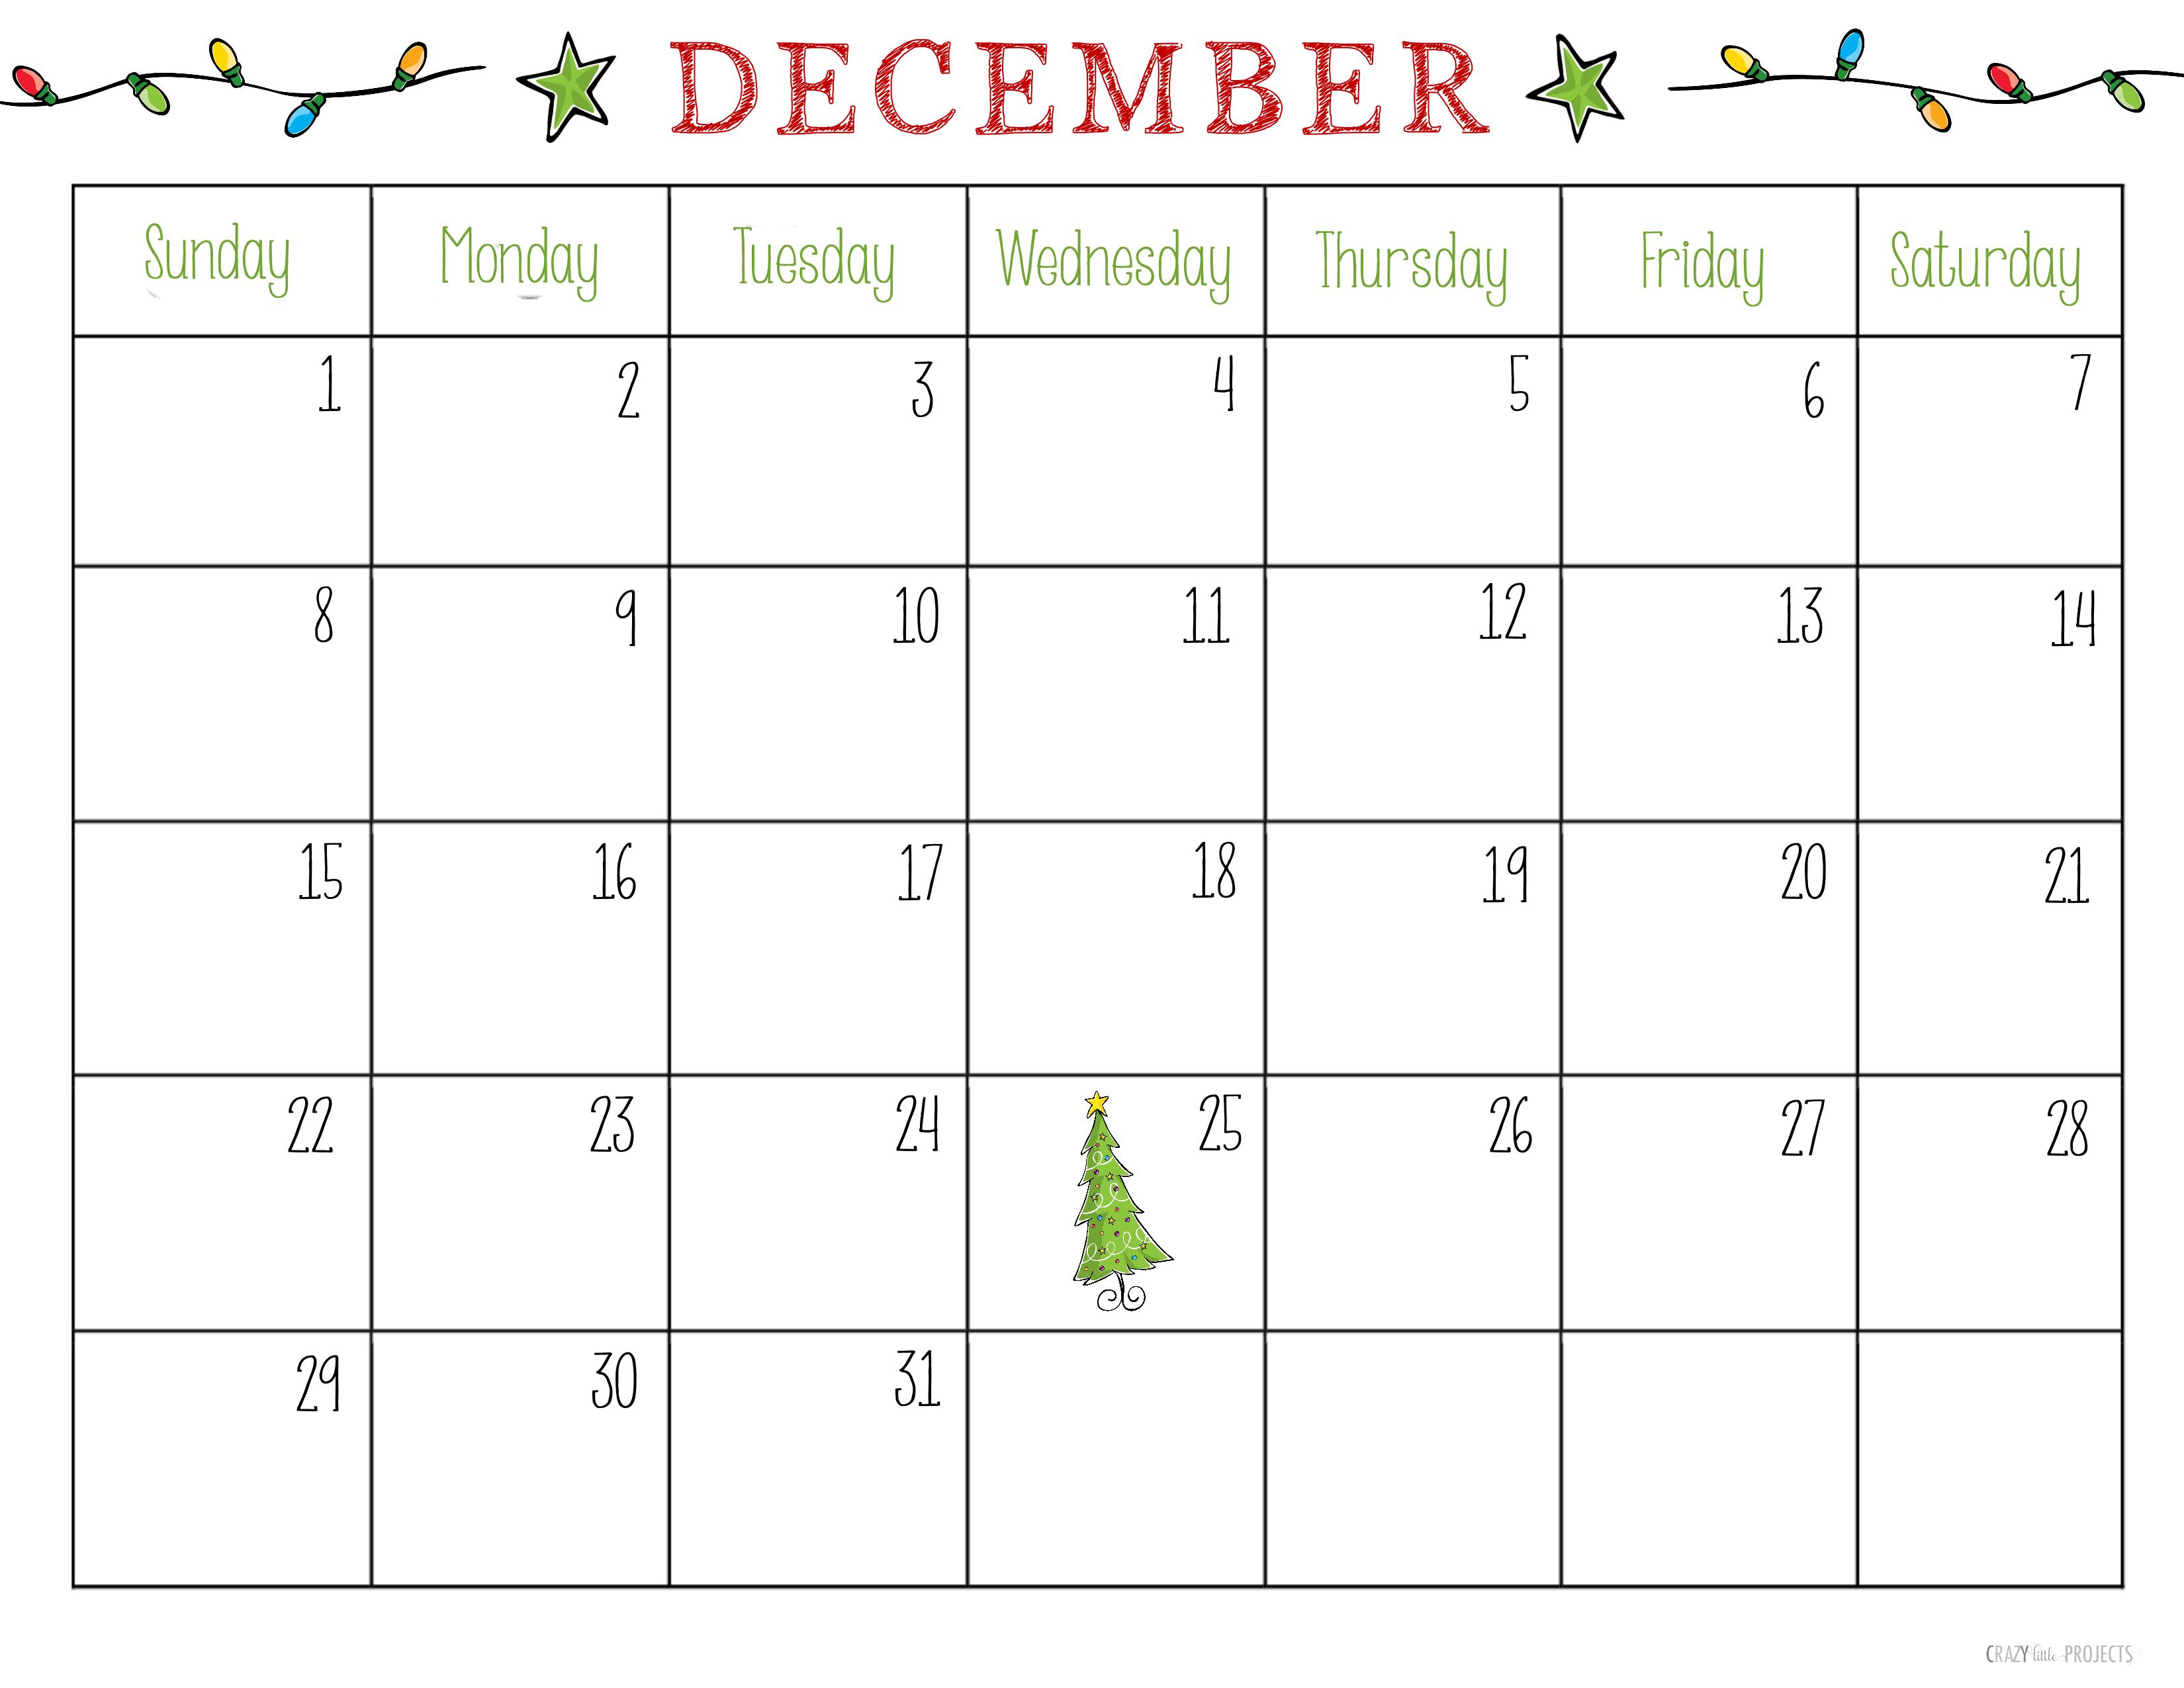 Cute Christmas December Calendar 2020 Free Printable Christmas Planner | Printable december calendar